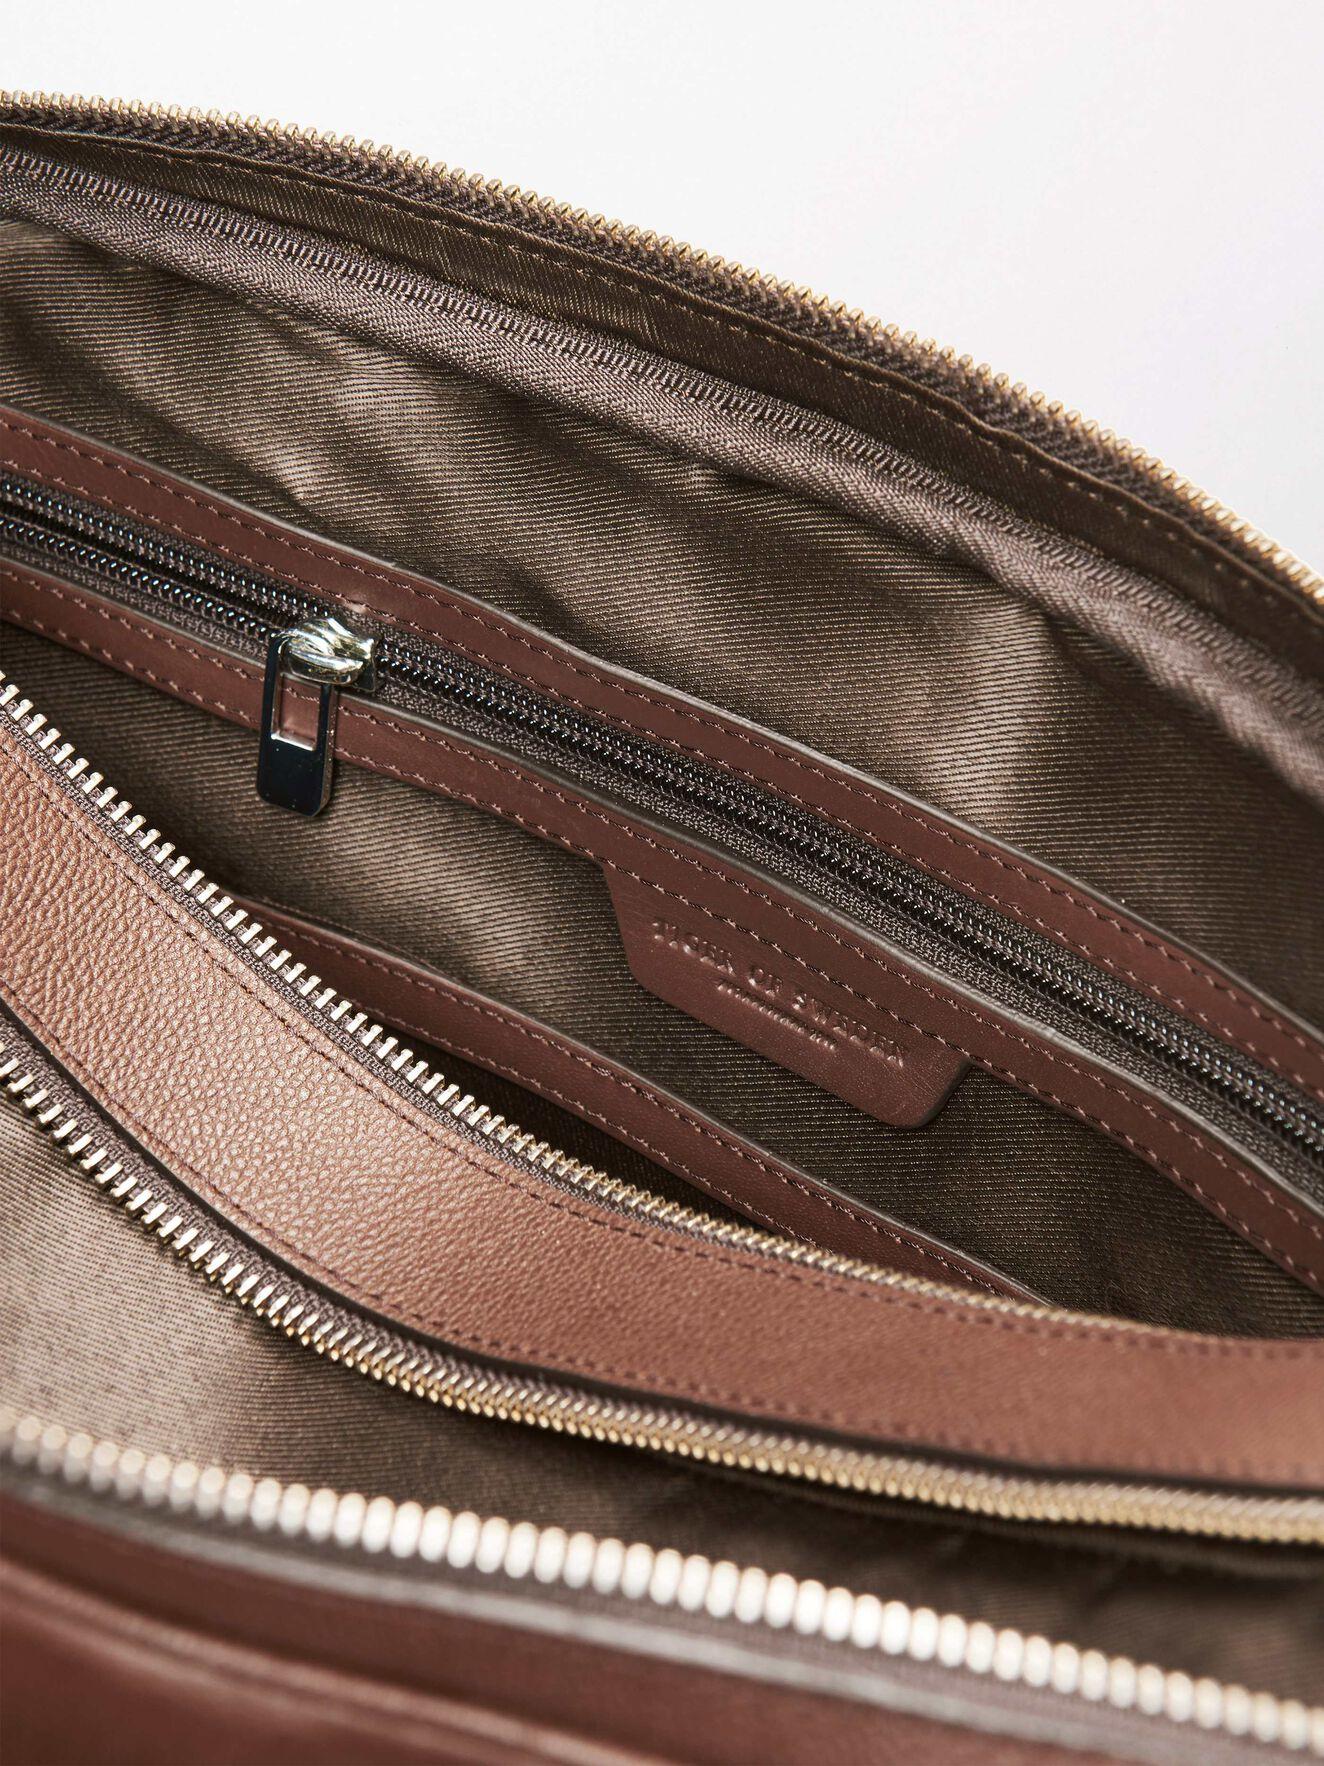 Printel Briefcase in Medium Brown from Tiger of Sweden